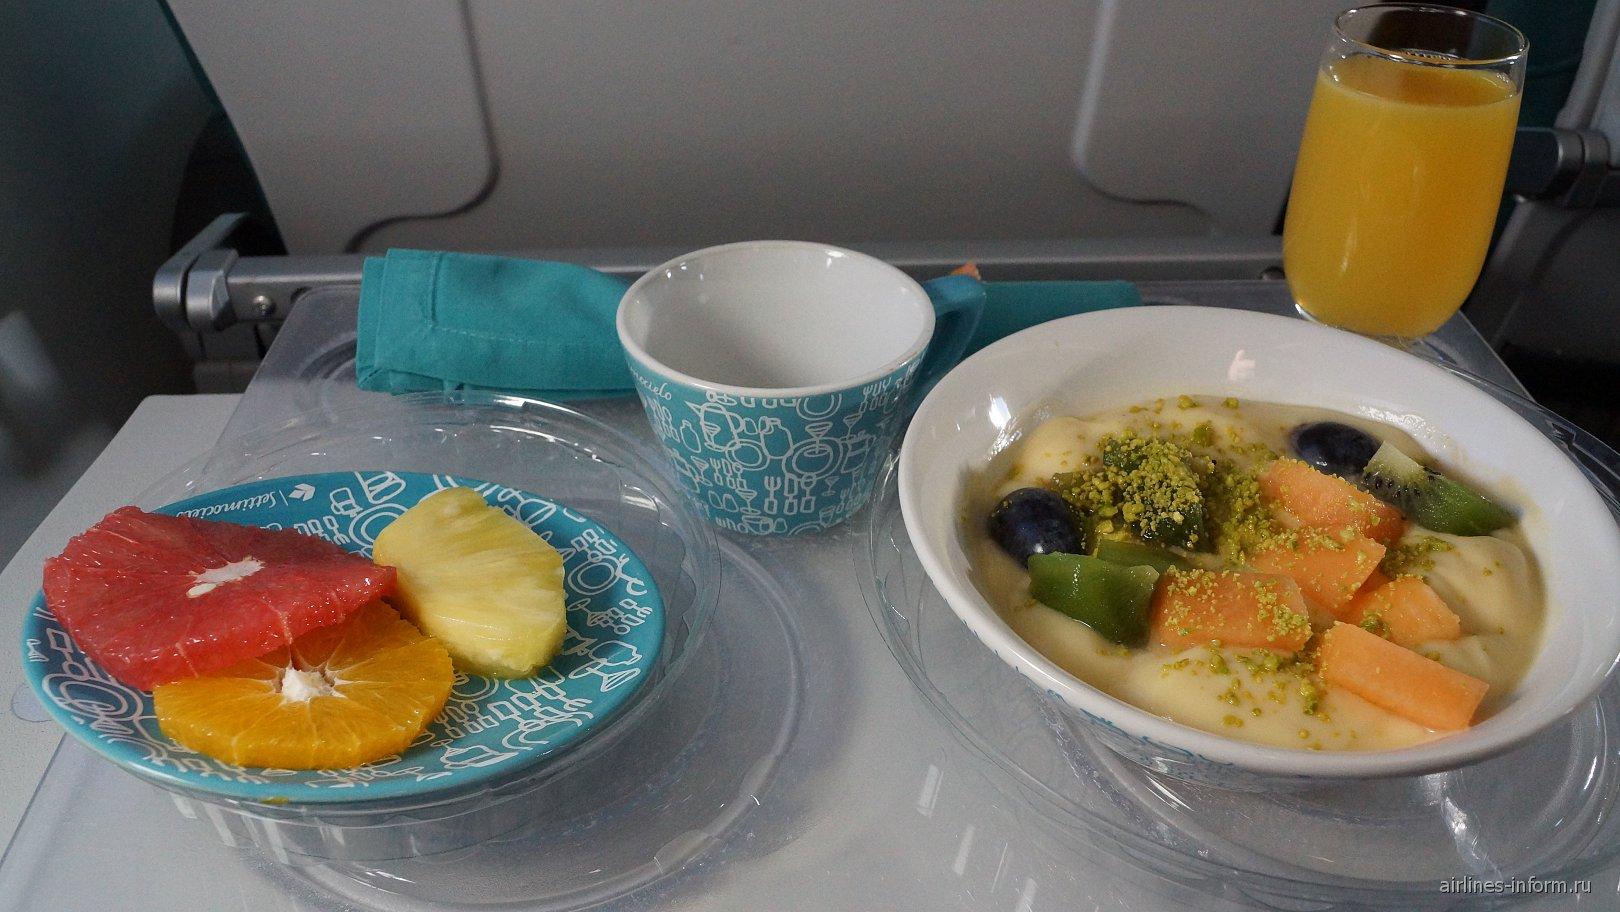 Питание в бизнес-классе на рейсе Мюнхен-Бари авиакомпании Air Dolomiti